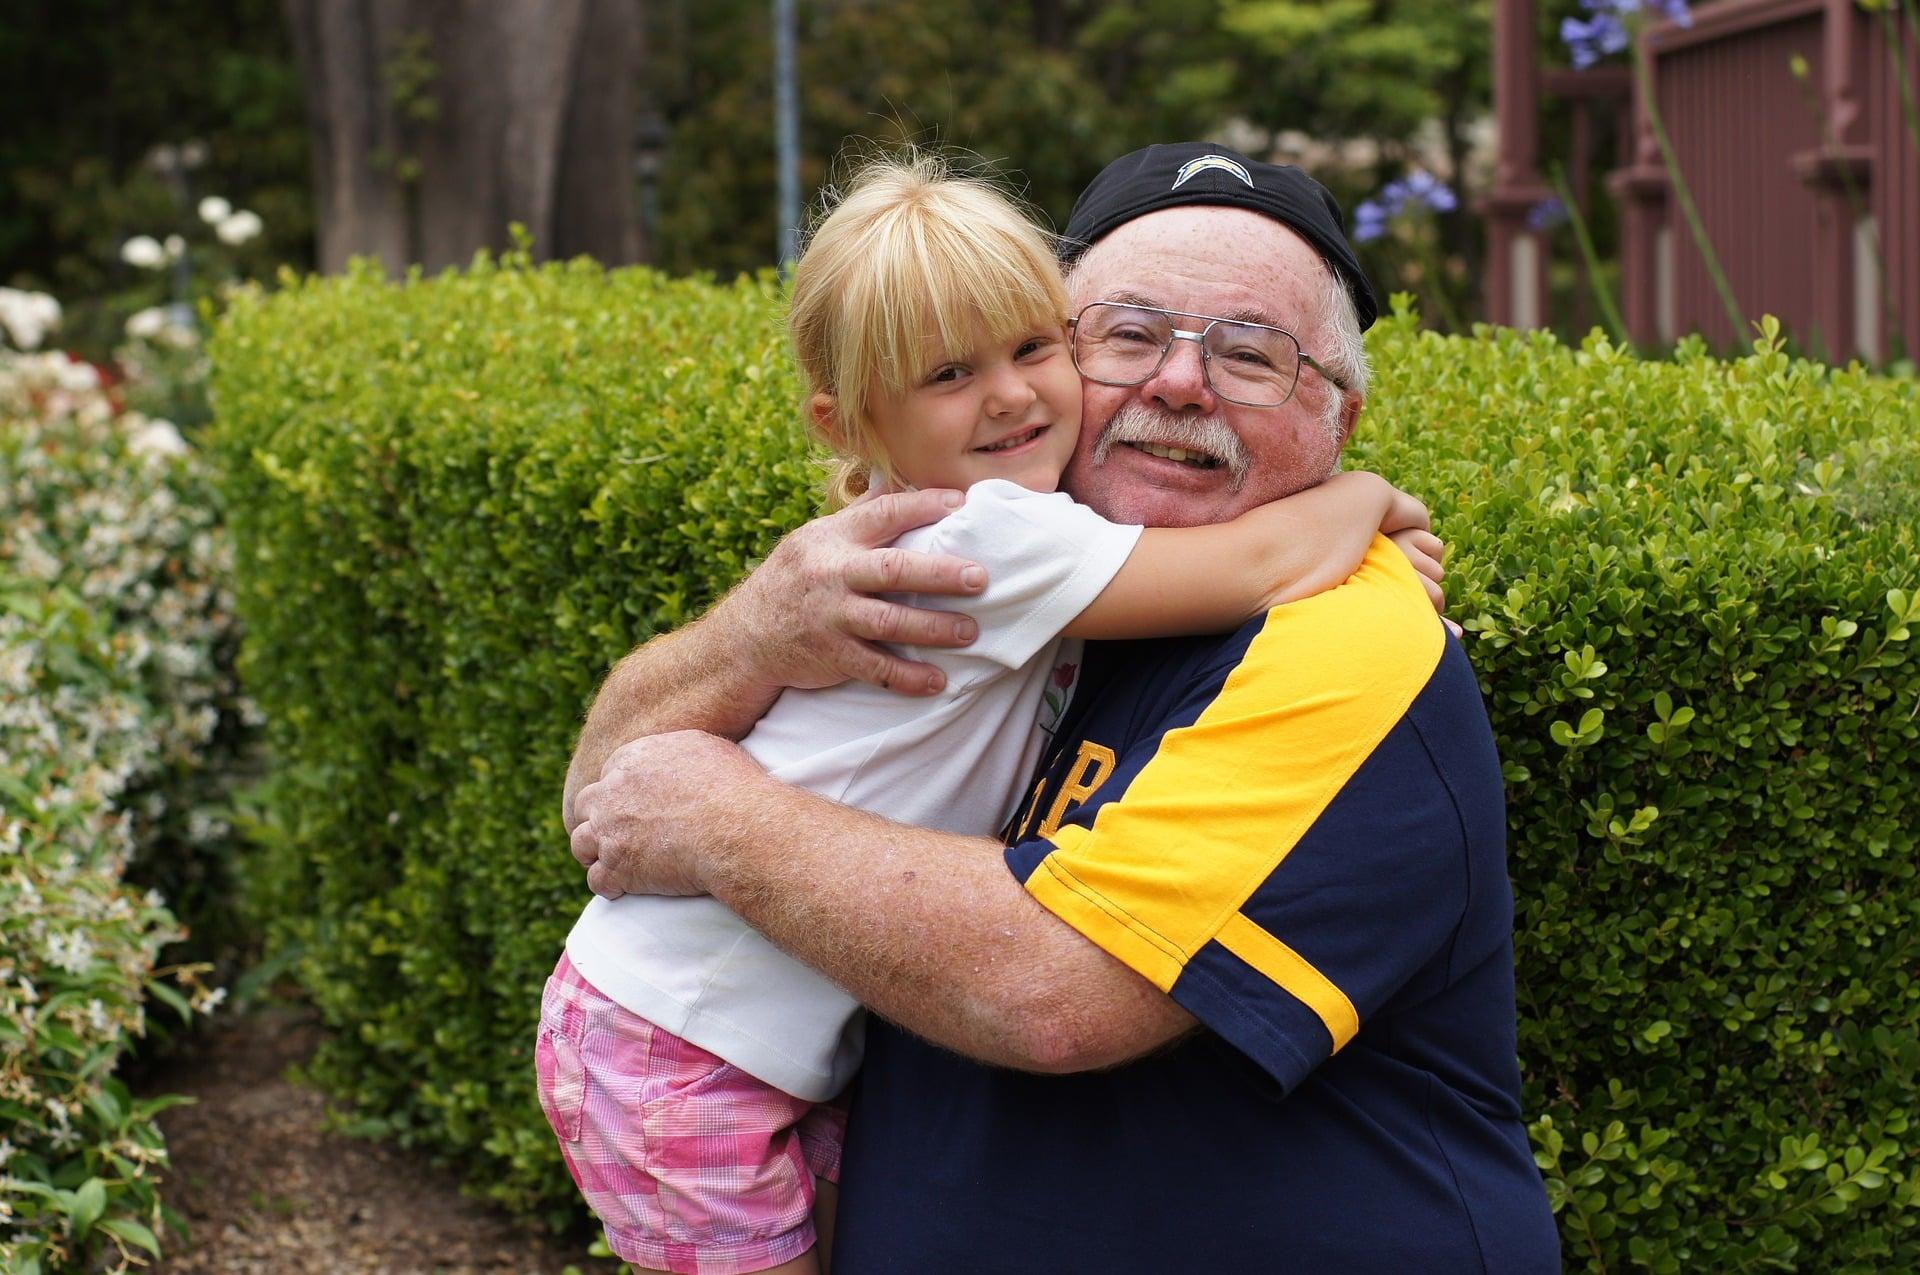 NZ Midwife 2-Year Training/Past Broke Present